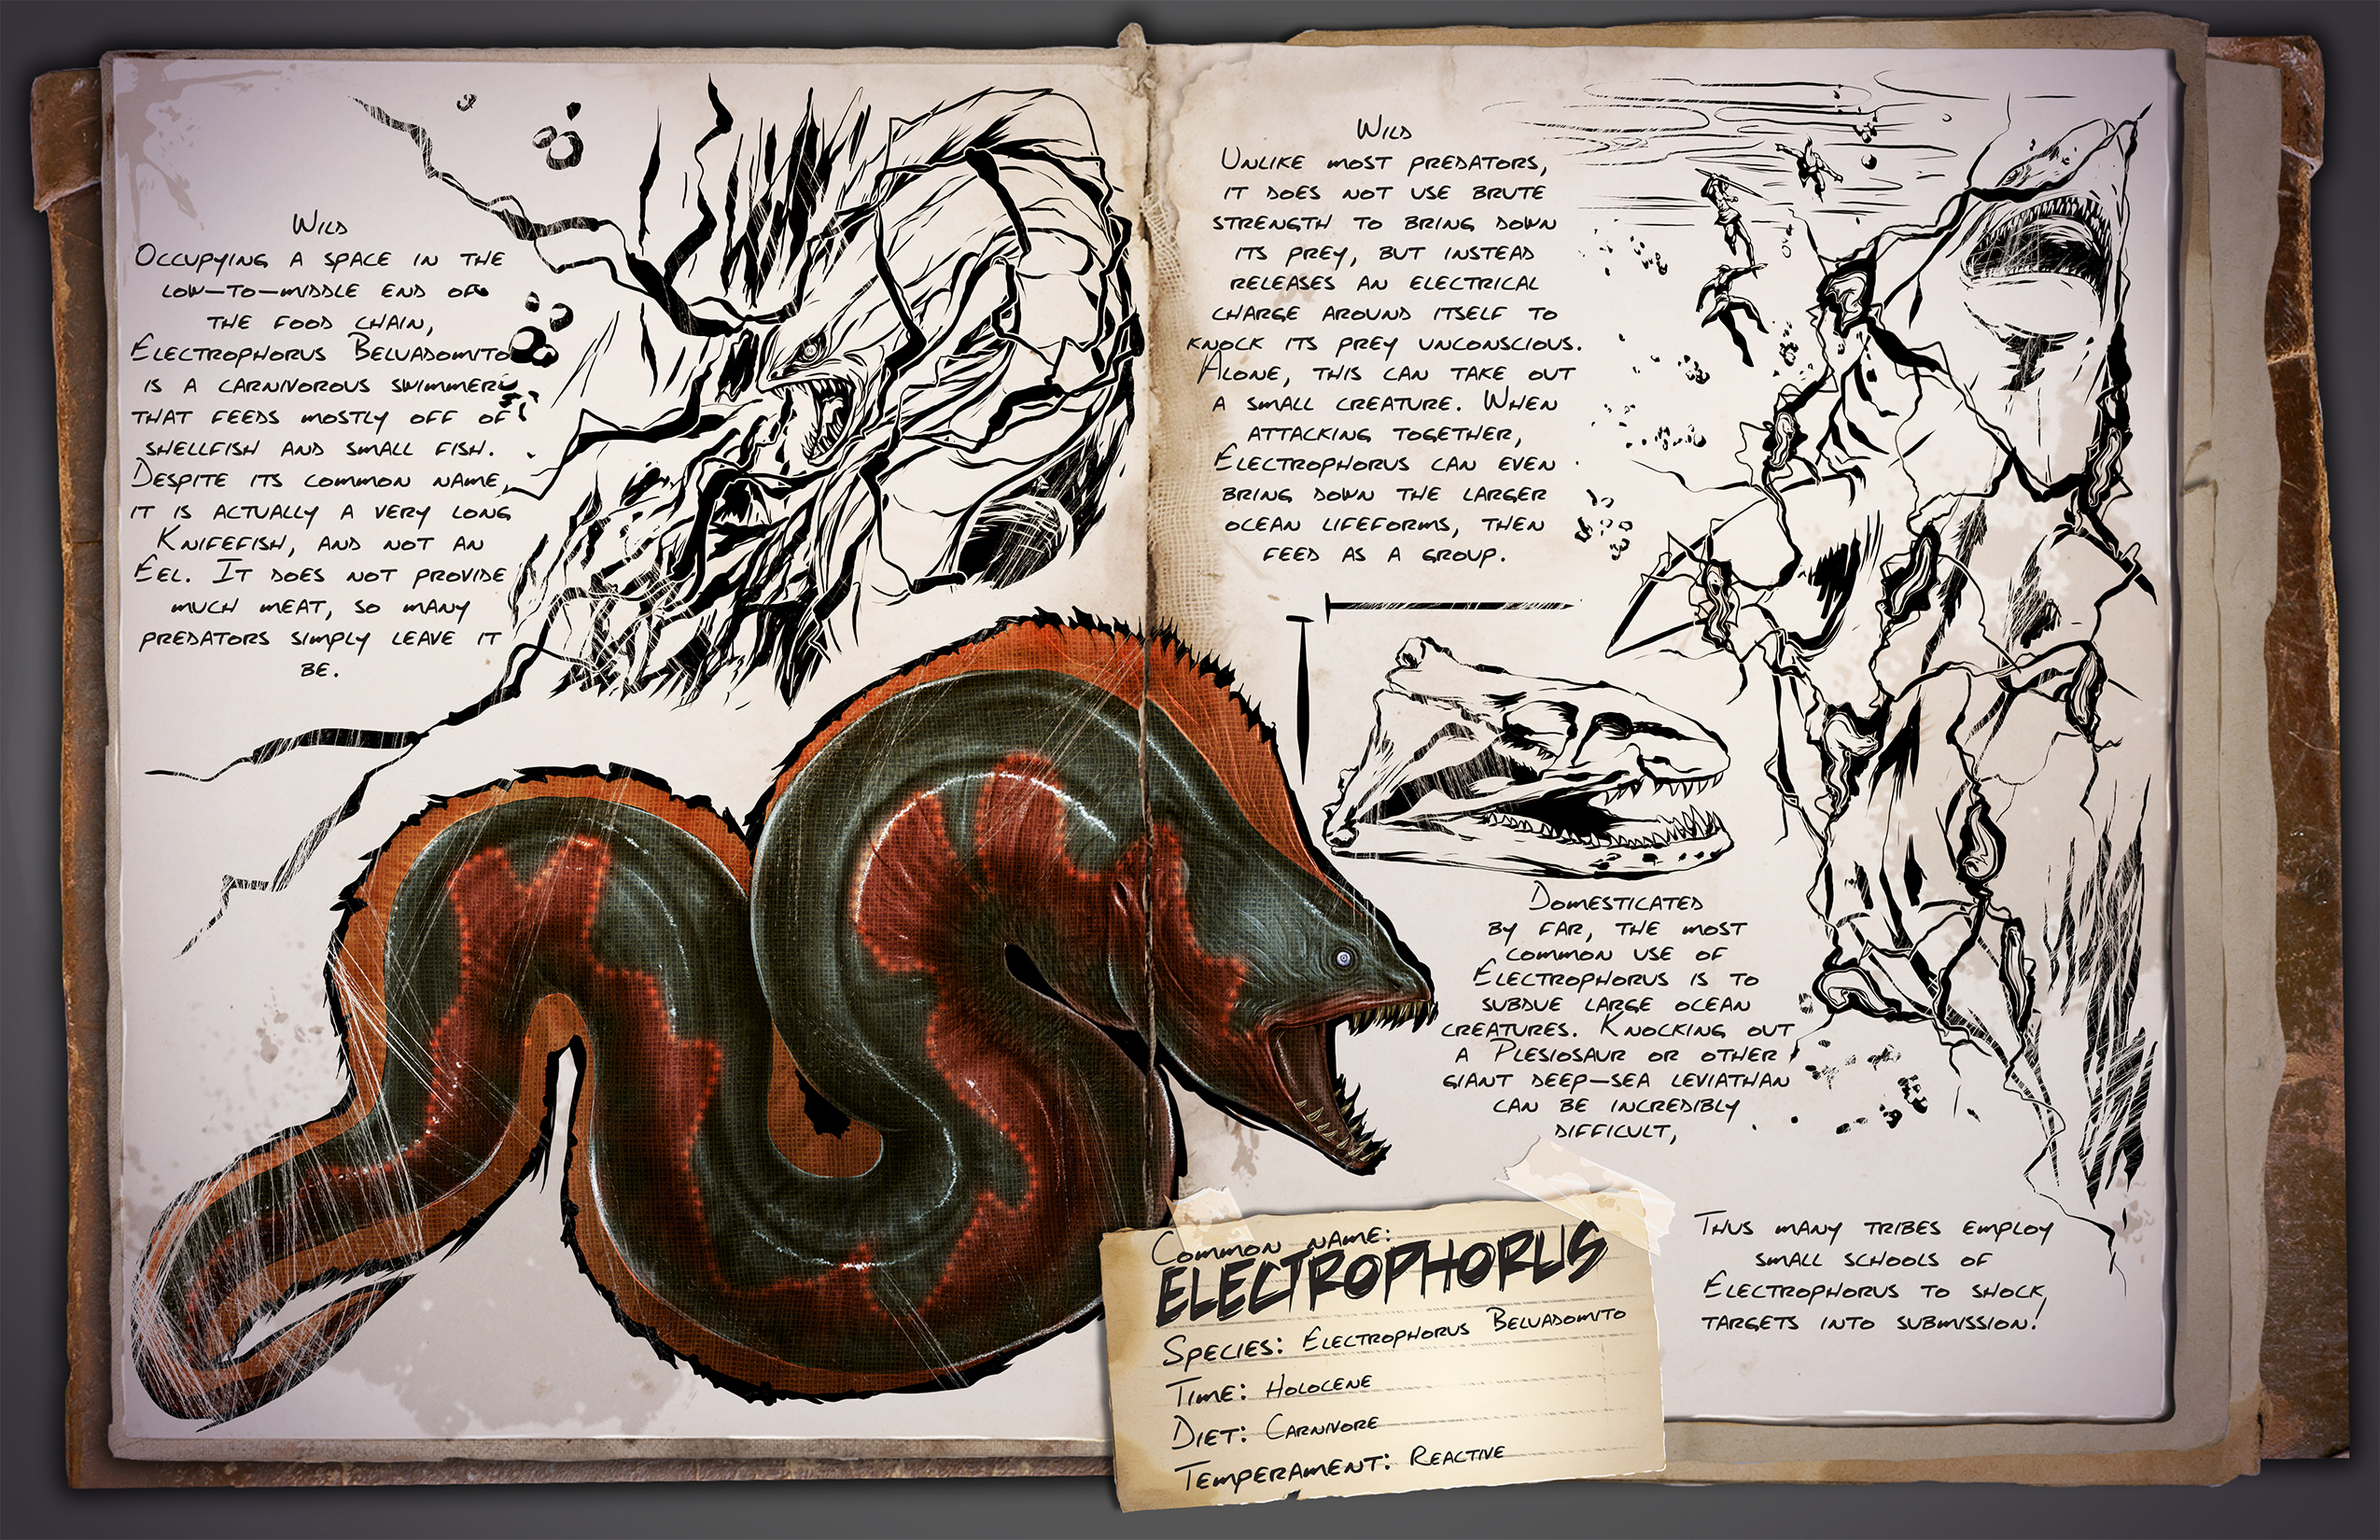 electrophorus beluadomito 7 27 15 dino dossier arkaholic